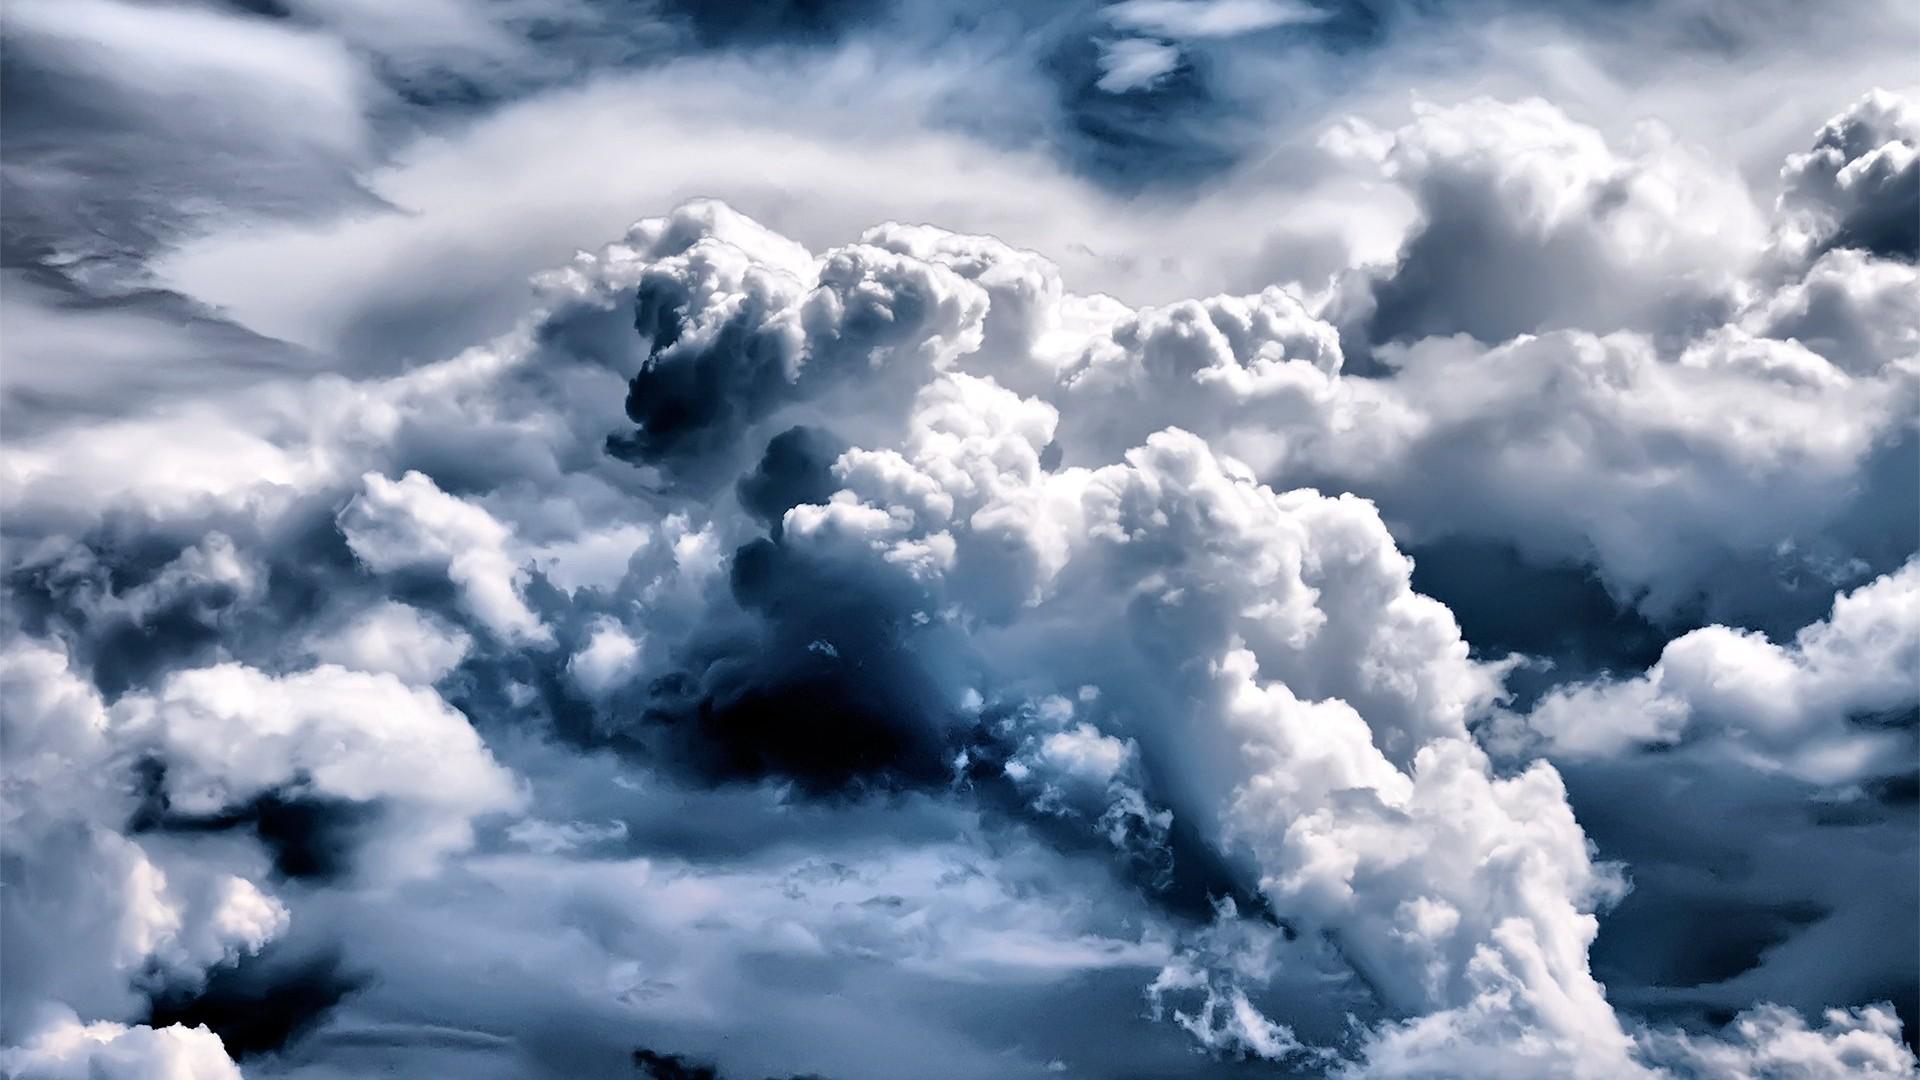 Nature Girl Wallpaper Cloud Wallpaper Nature Hd Desktop Wallpapers 4k Hd